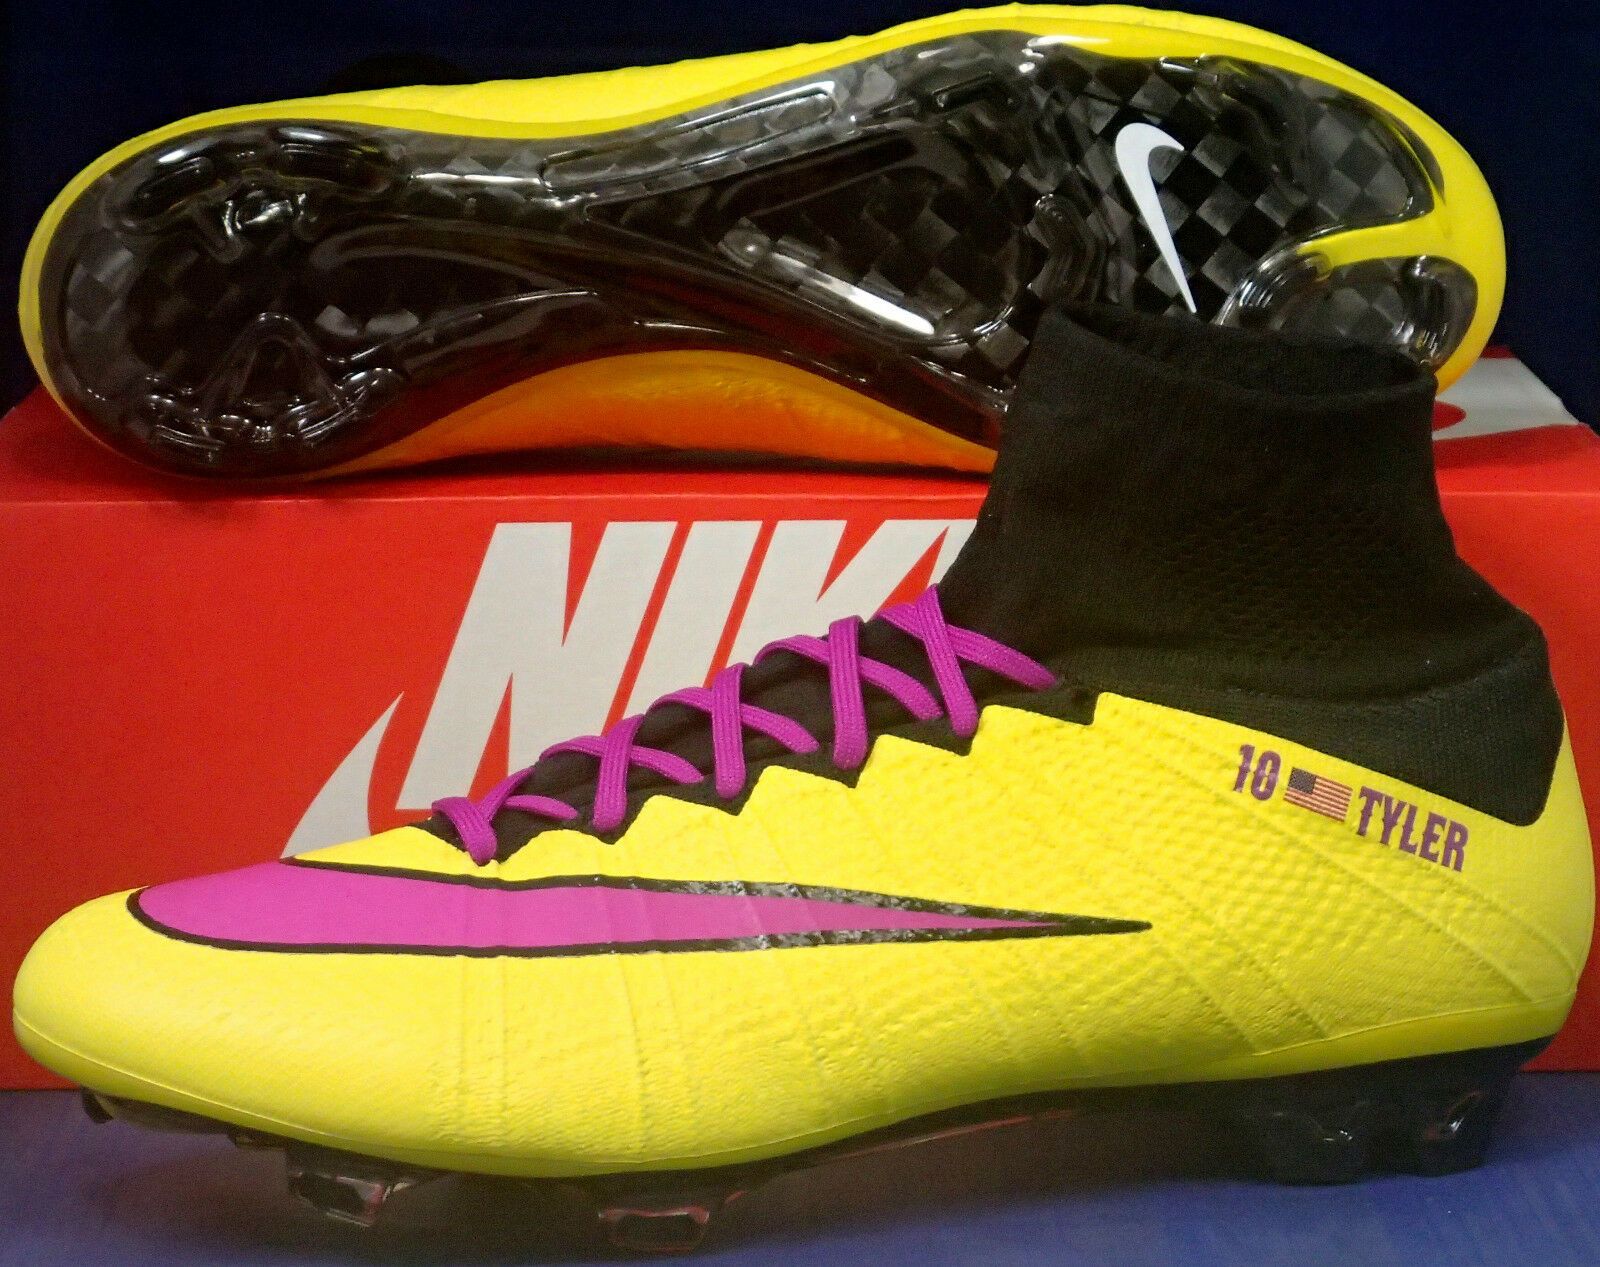 Nike Mercurial Superfly FG iD Yellow Fuchsia Black Boots SZ US 11.5 (651789-981)